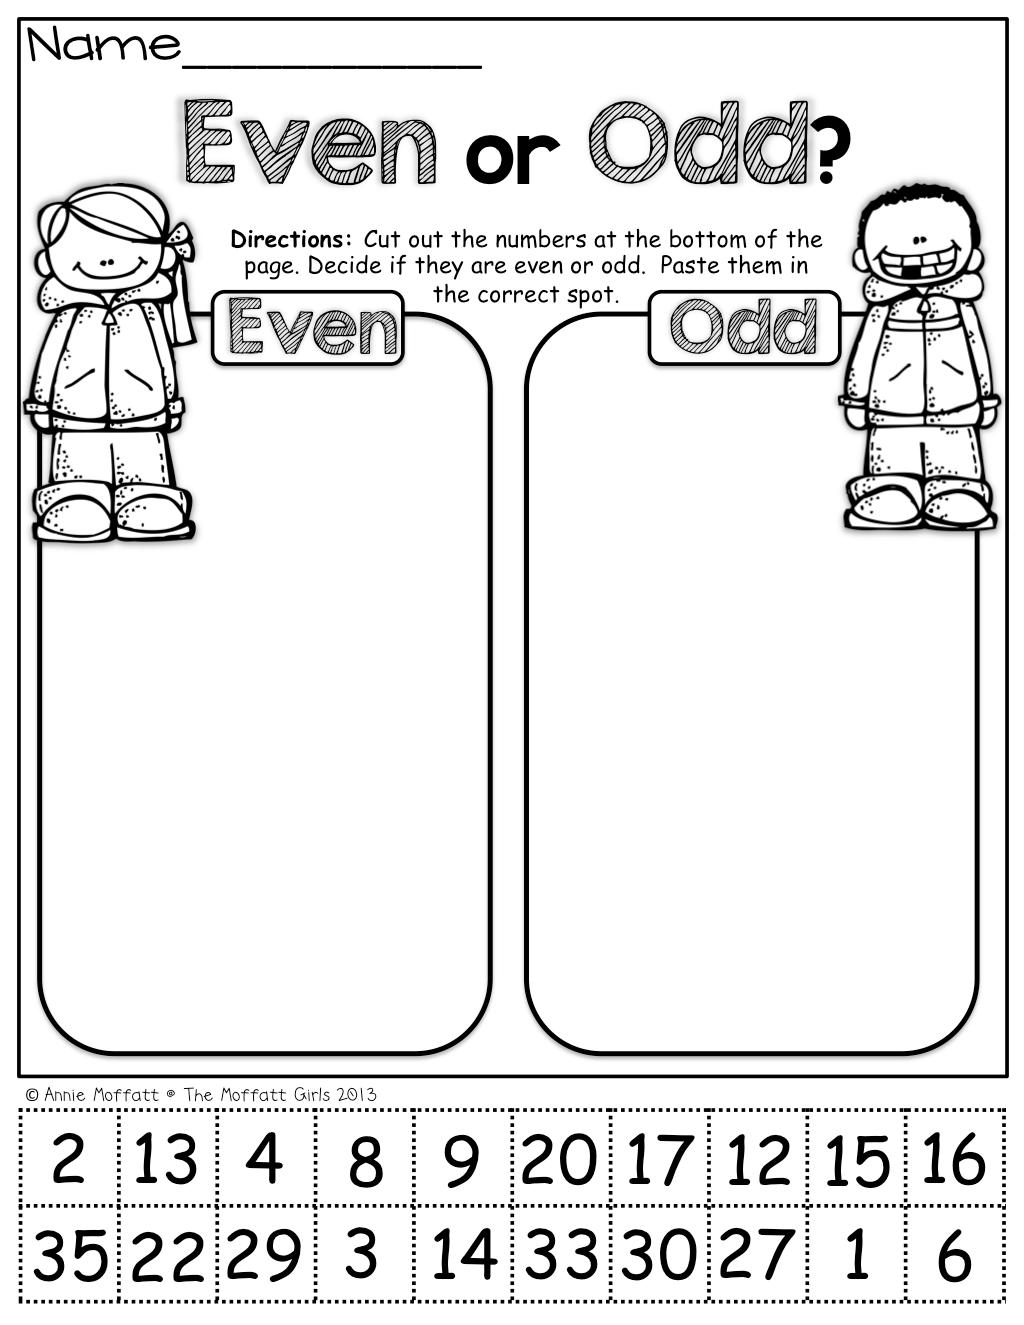 Even Odd Worksheets For Second Grade